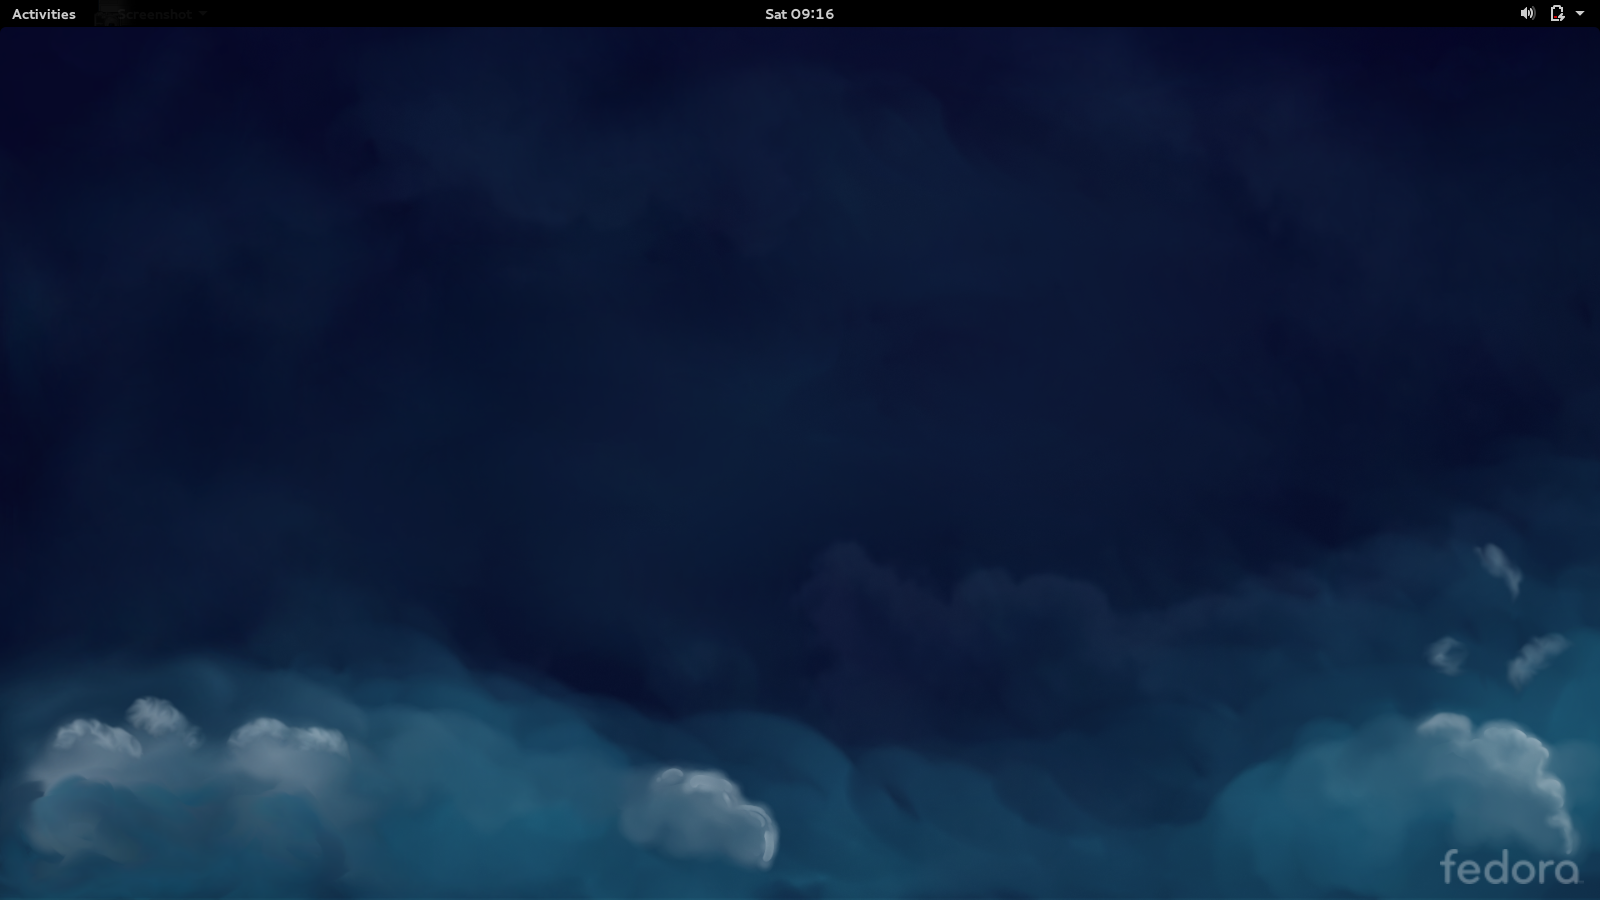 Fedora Core Project